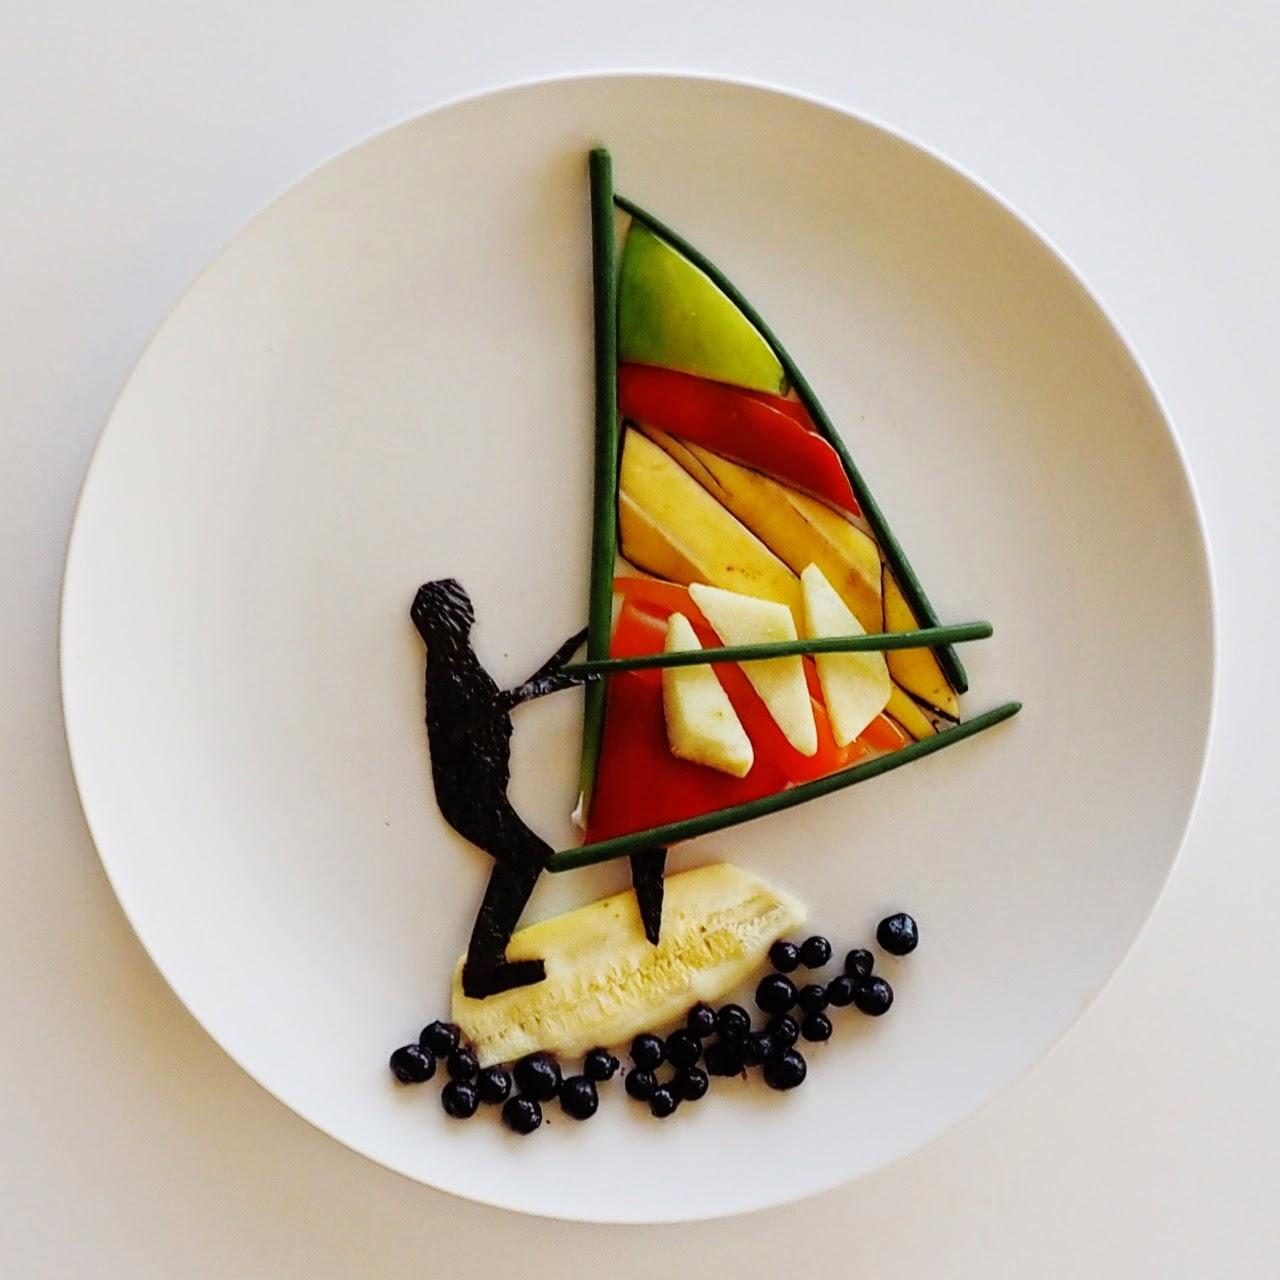 07-Windsurfer-Lauren-Purnell-Love-Art-and Love-for-Food-www-designstack-co